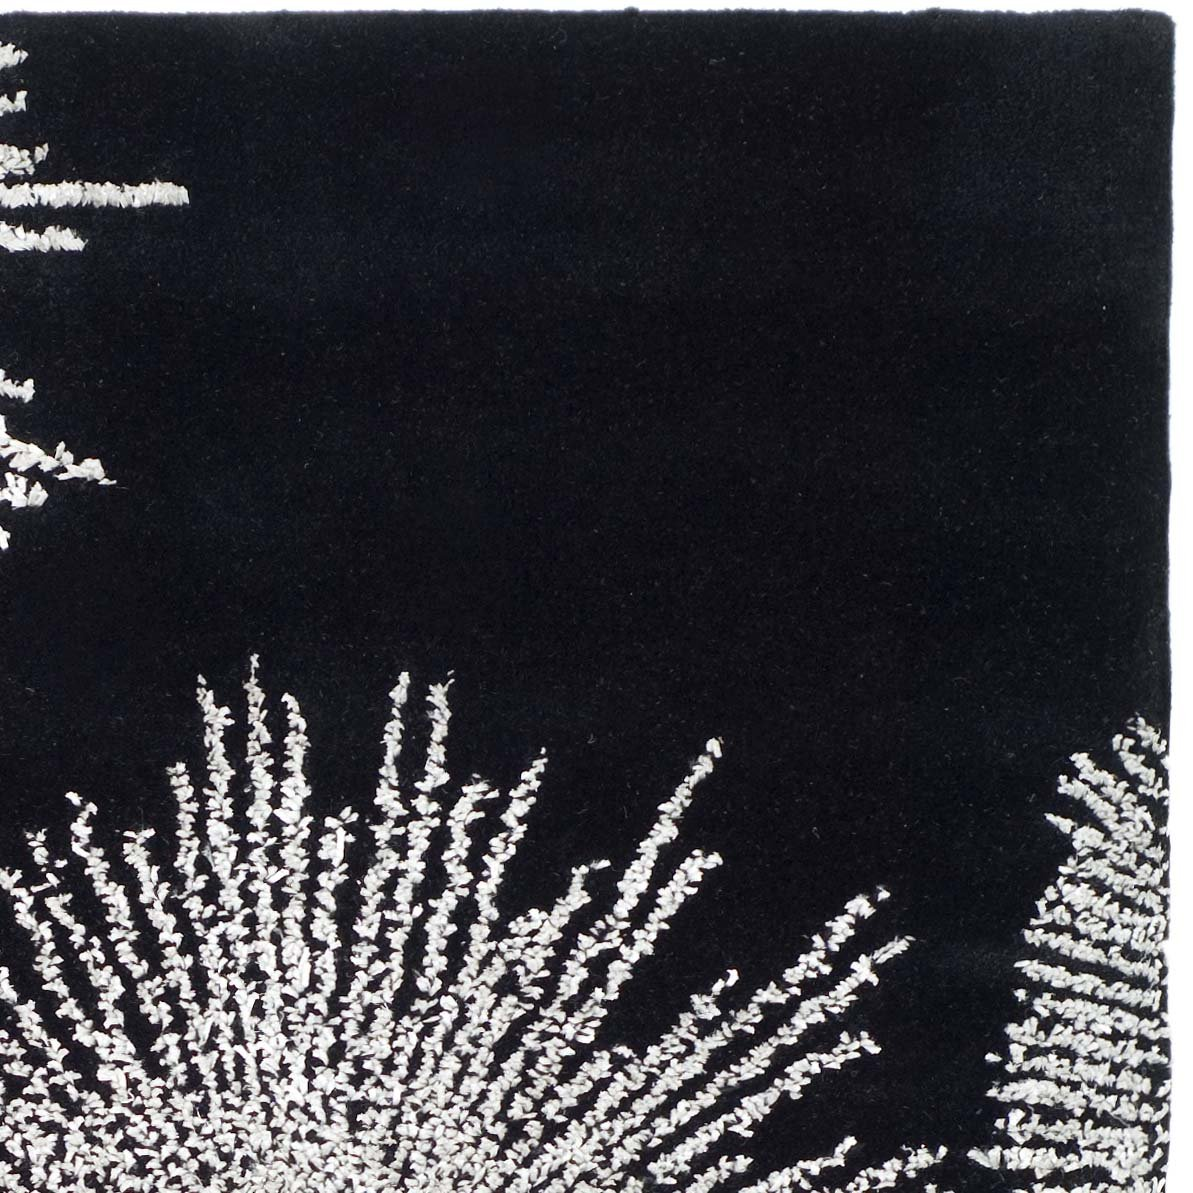 Safavieh Soho Collection SOH712D Handmade Fireworks Black and White Premium Wool Area Rug (2 x 3)